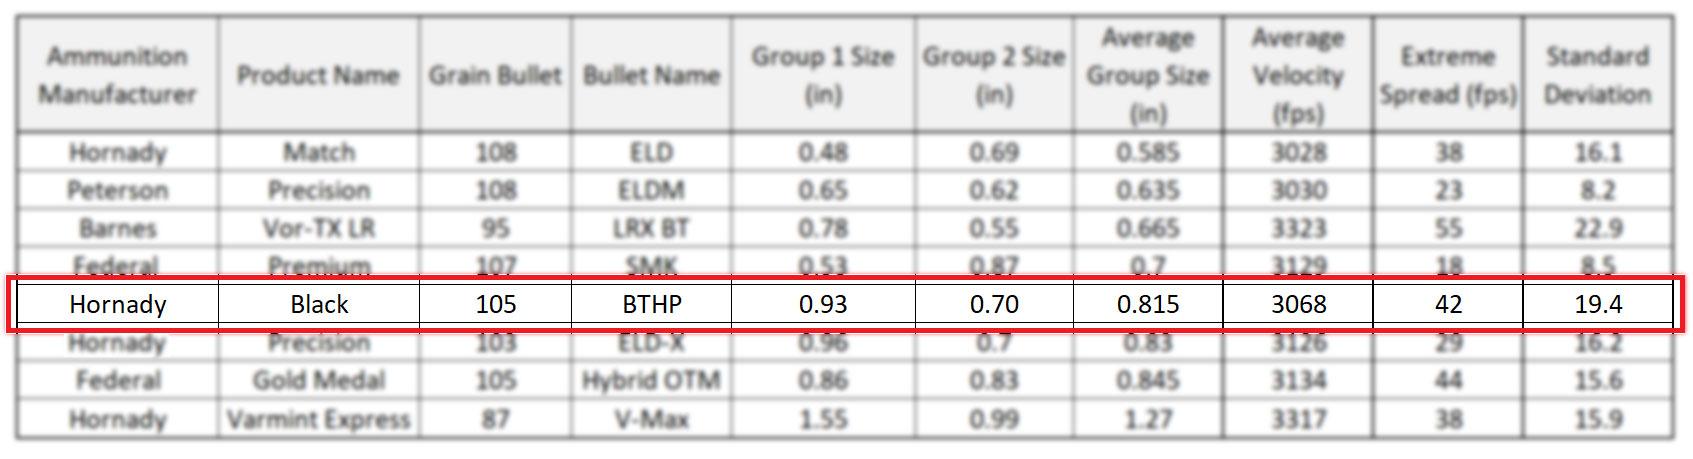 Hornady Black 105 grain BTHP - 6mm Creedmoor Ammunition Accuracy Results